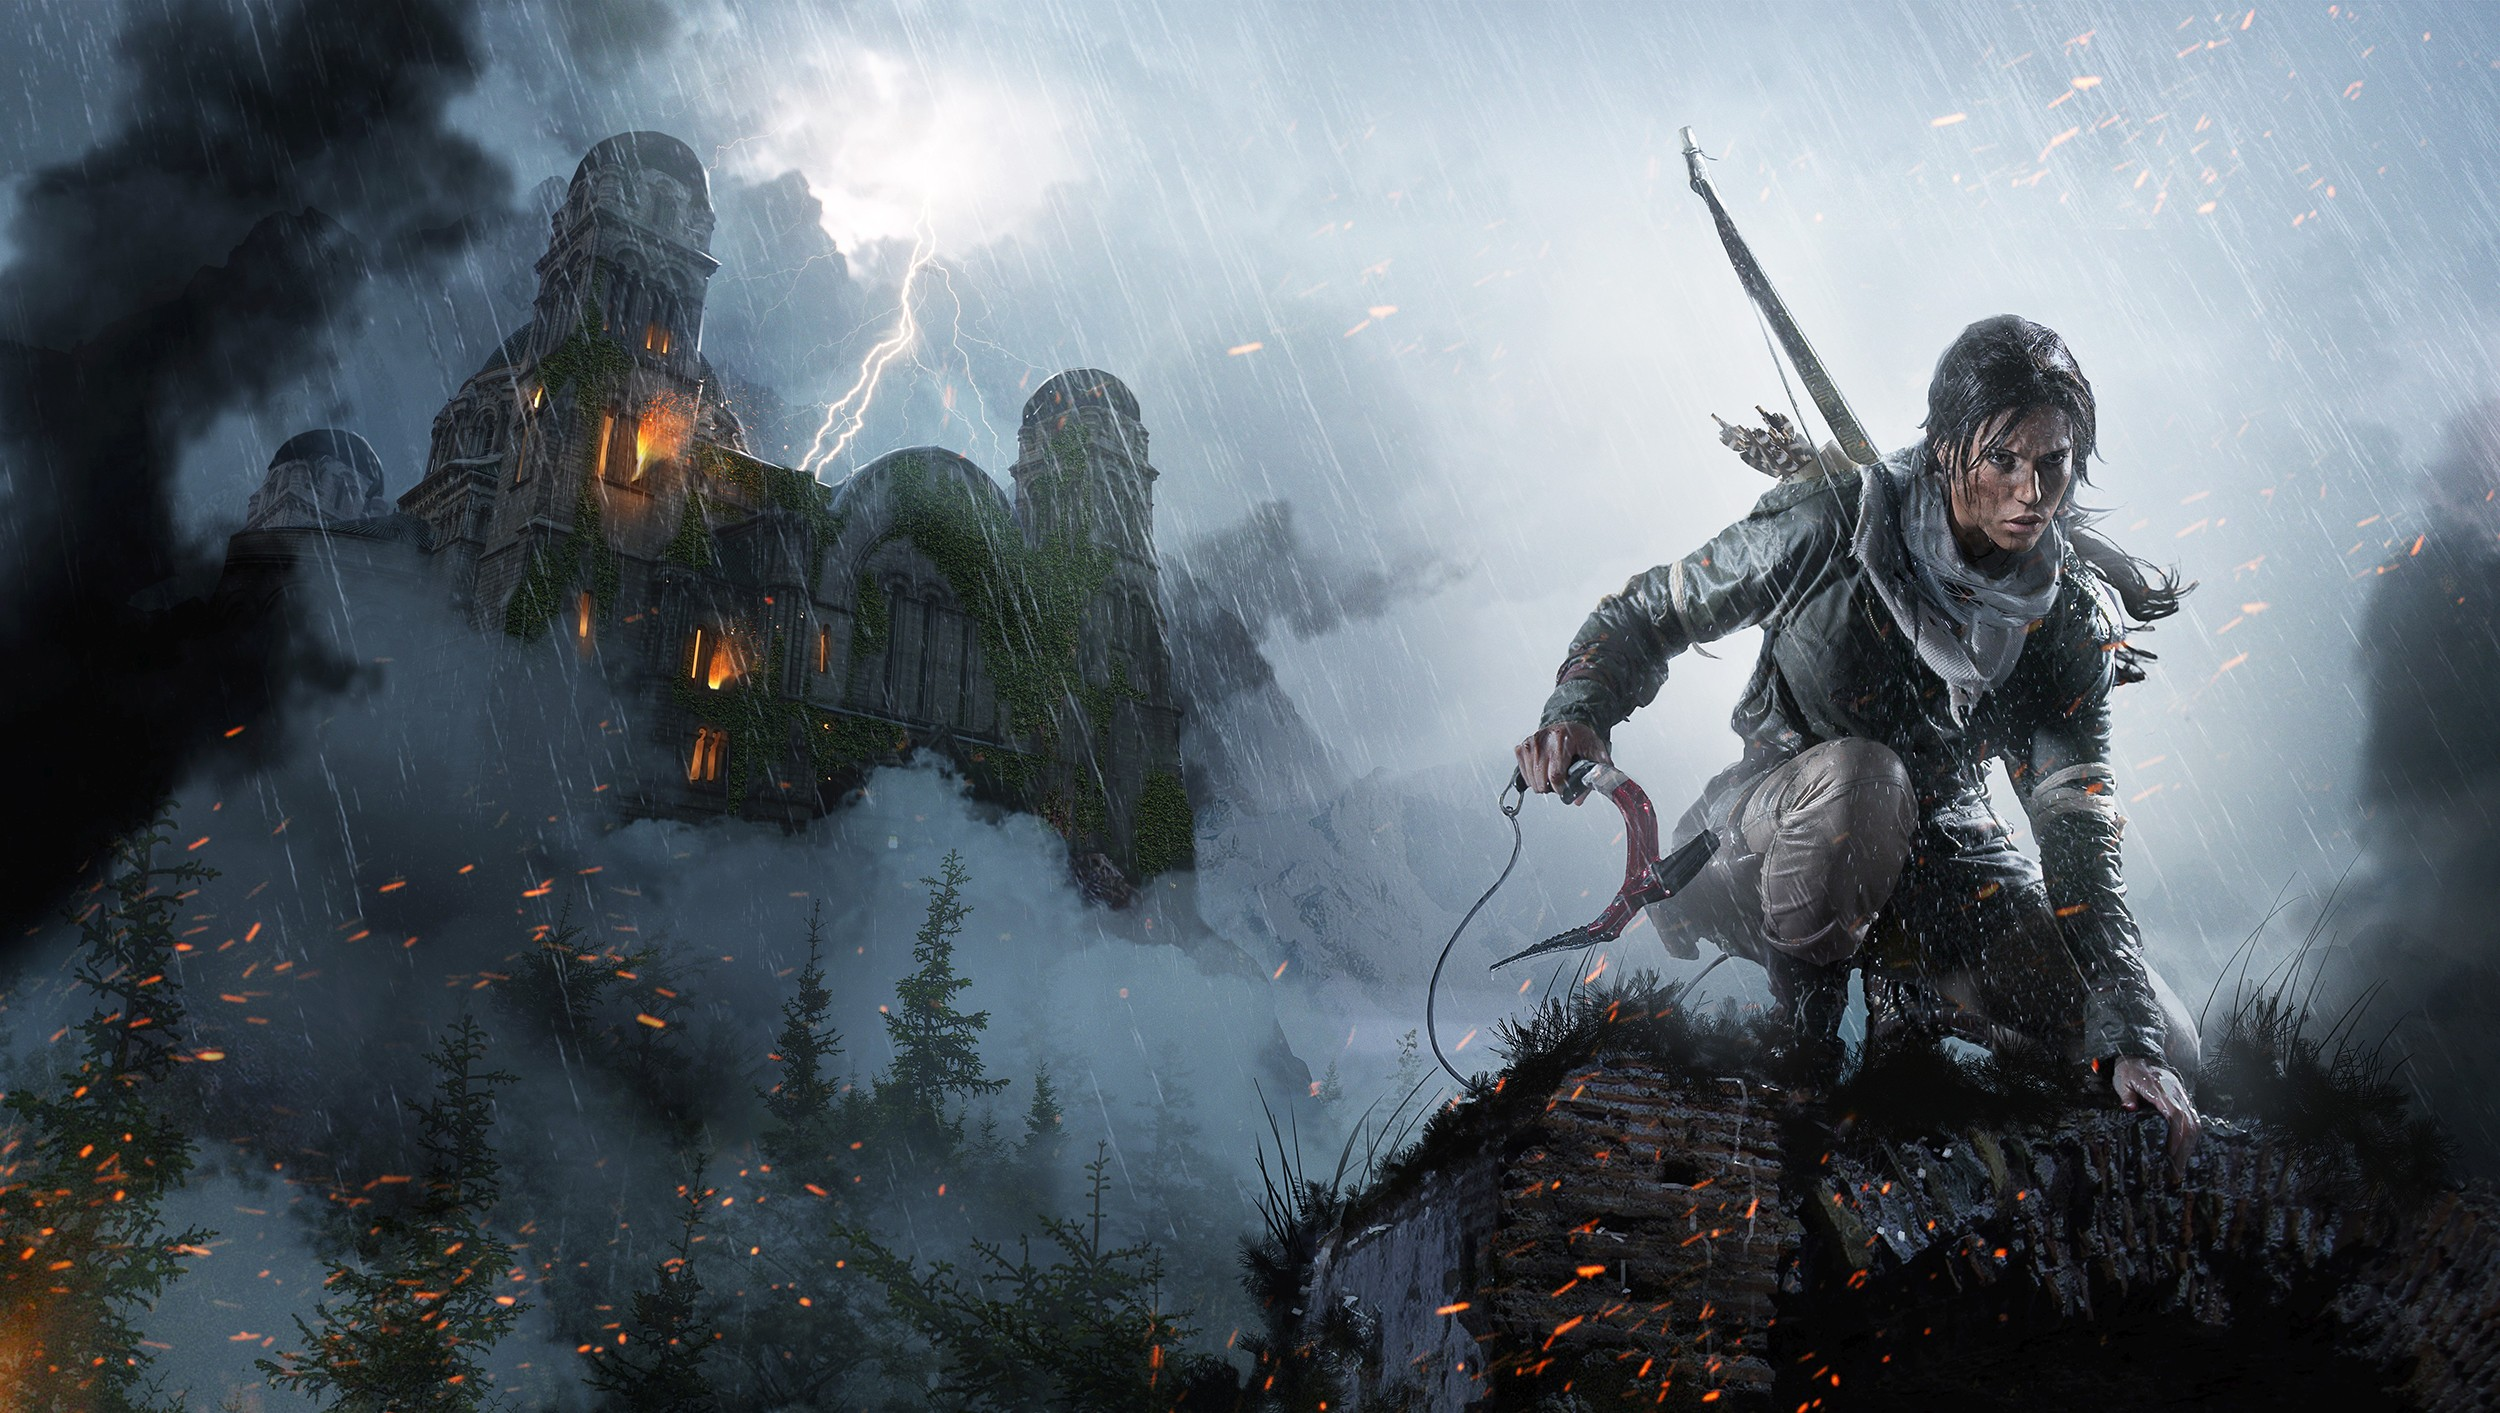 Rise-of-The-Tomb-Raider-Baba-Yaga